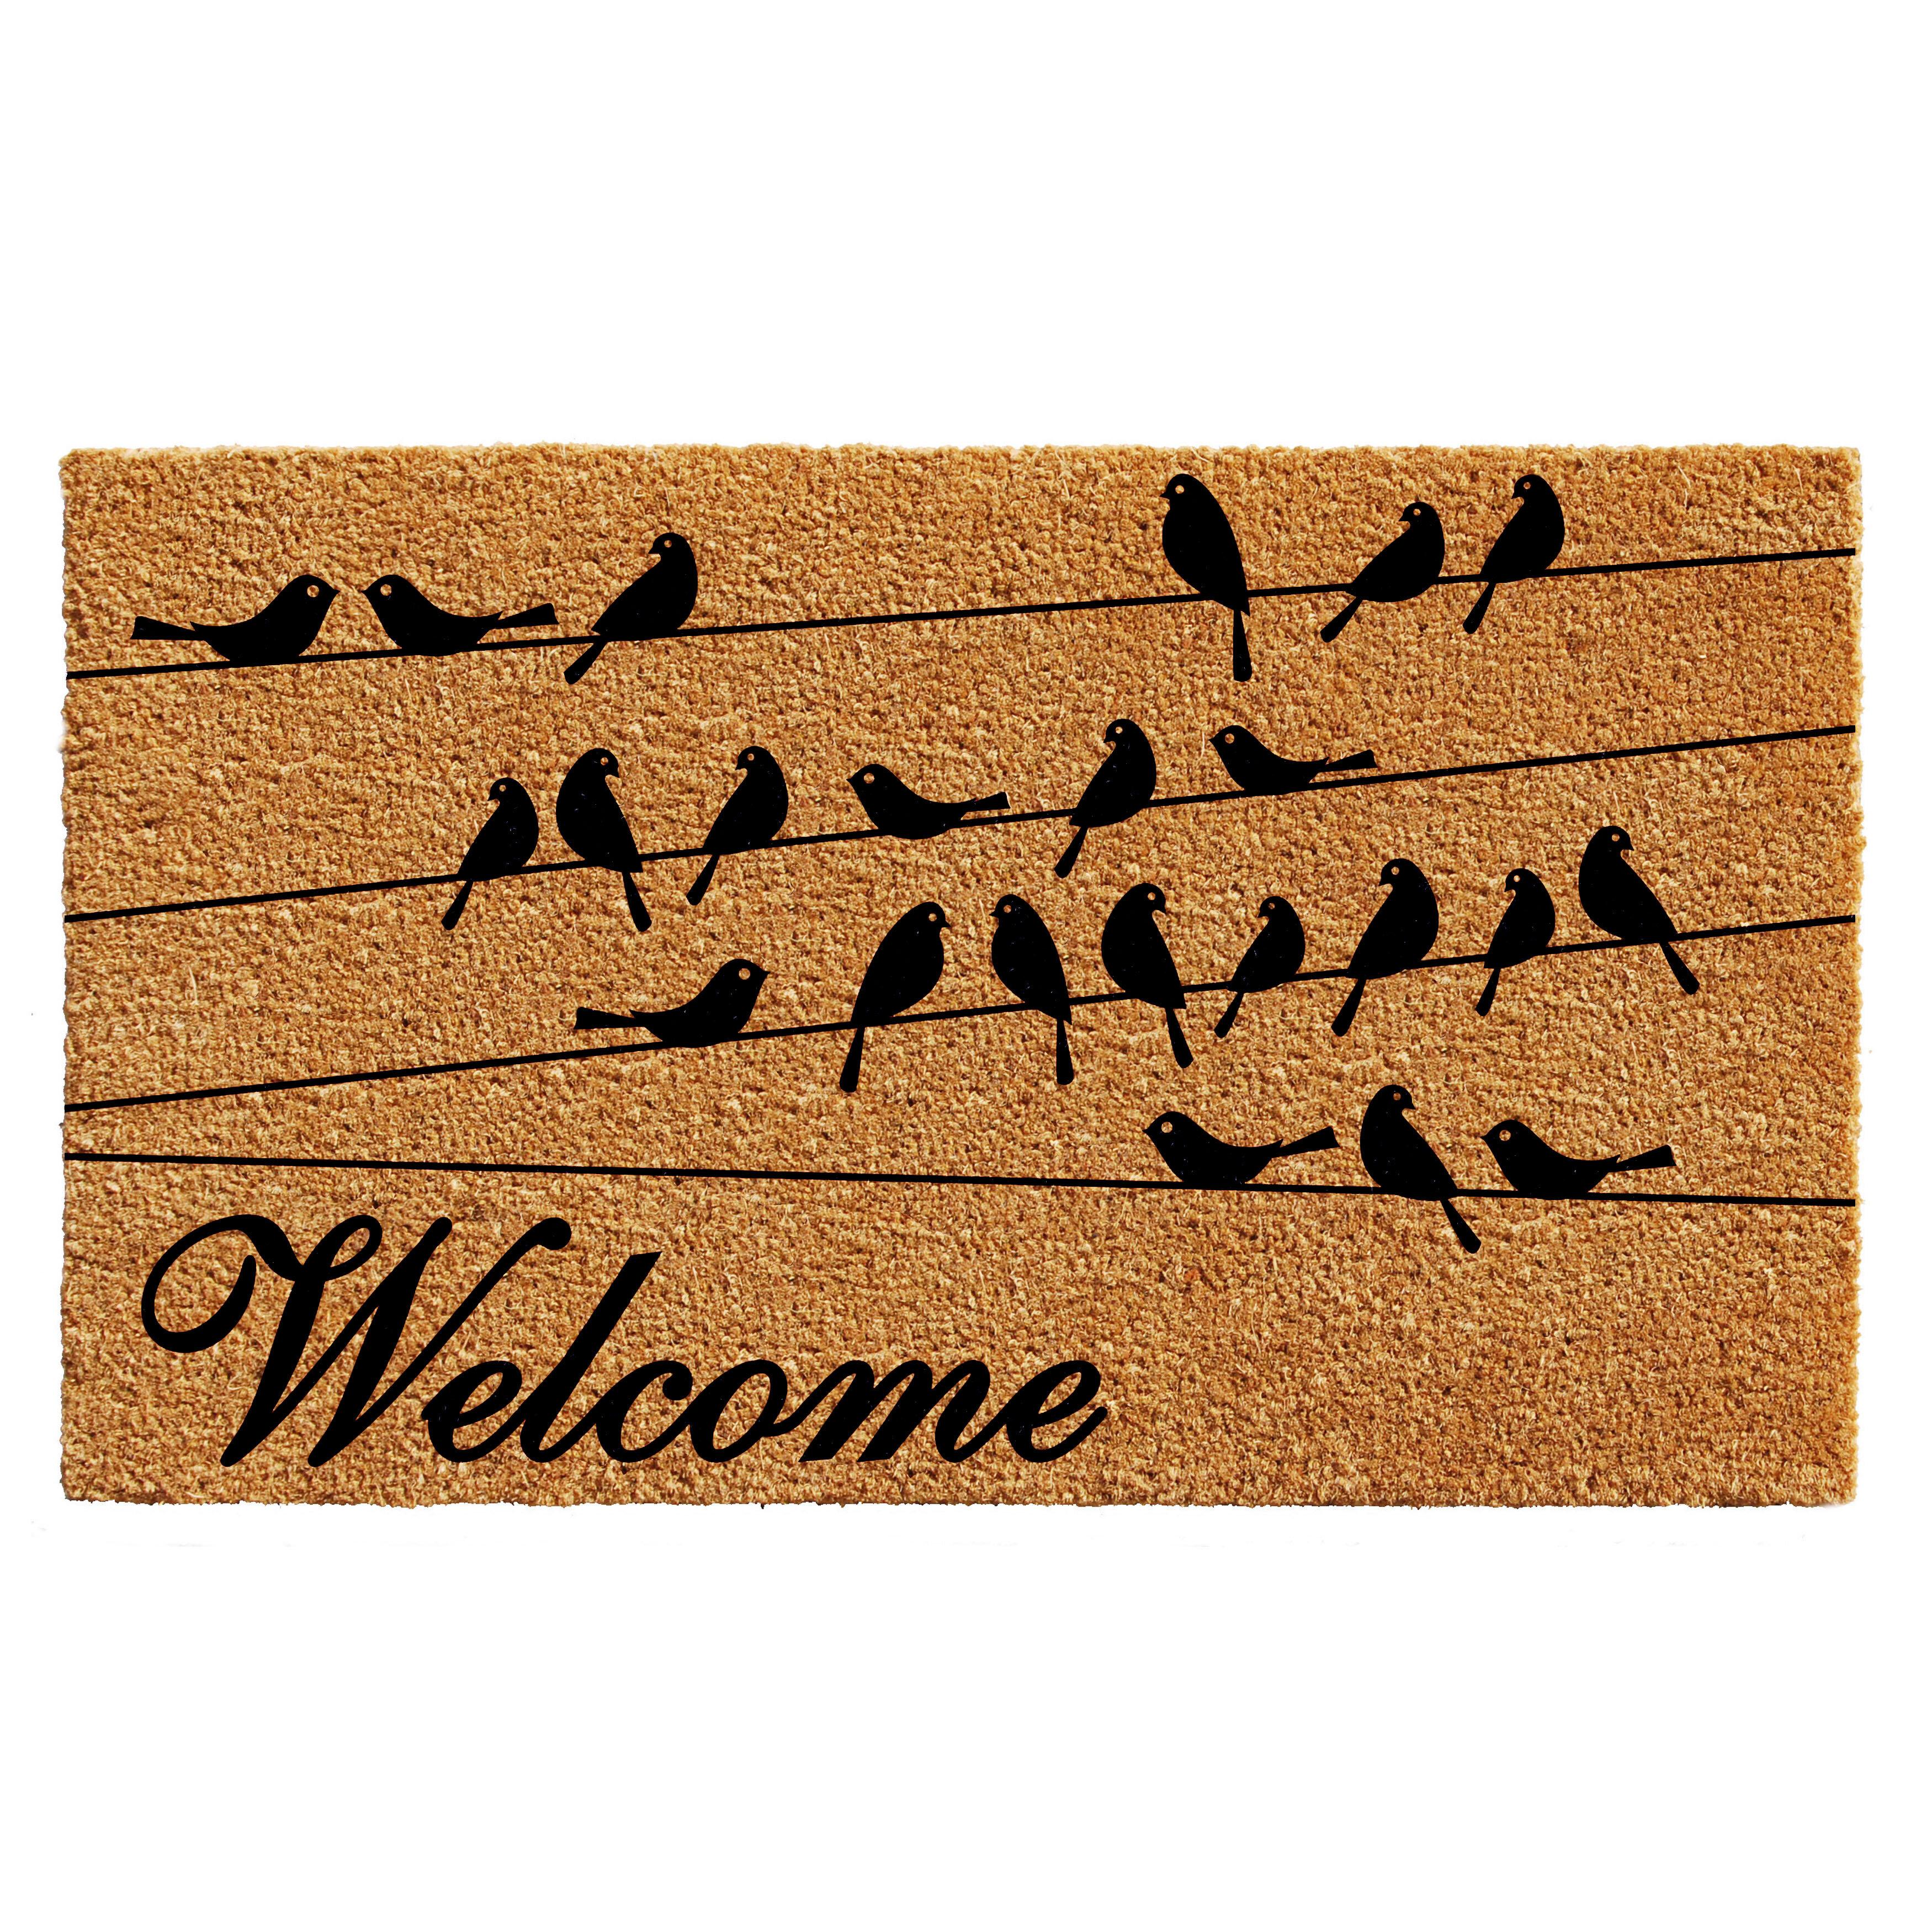 Welcome Birds Flowers Natural Coir Door Mat PVC Anti Slip Rug Entrance Floor Mat